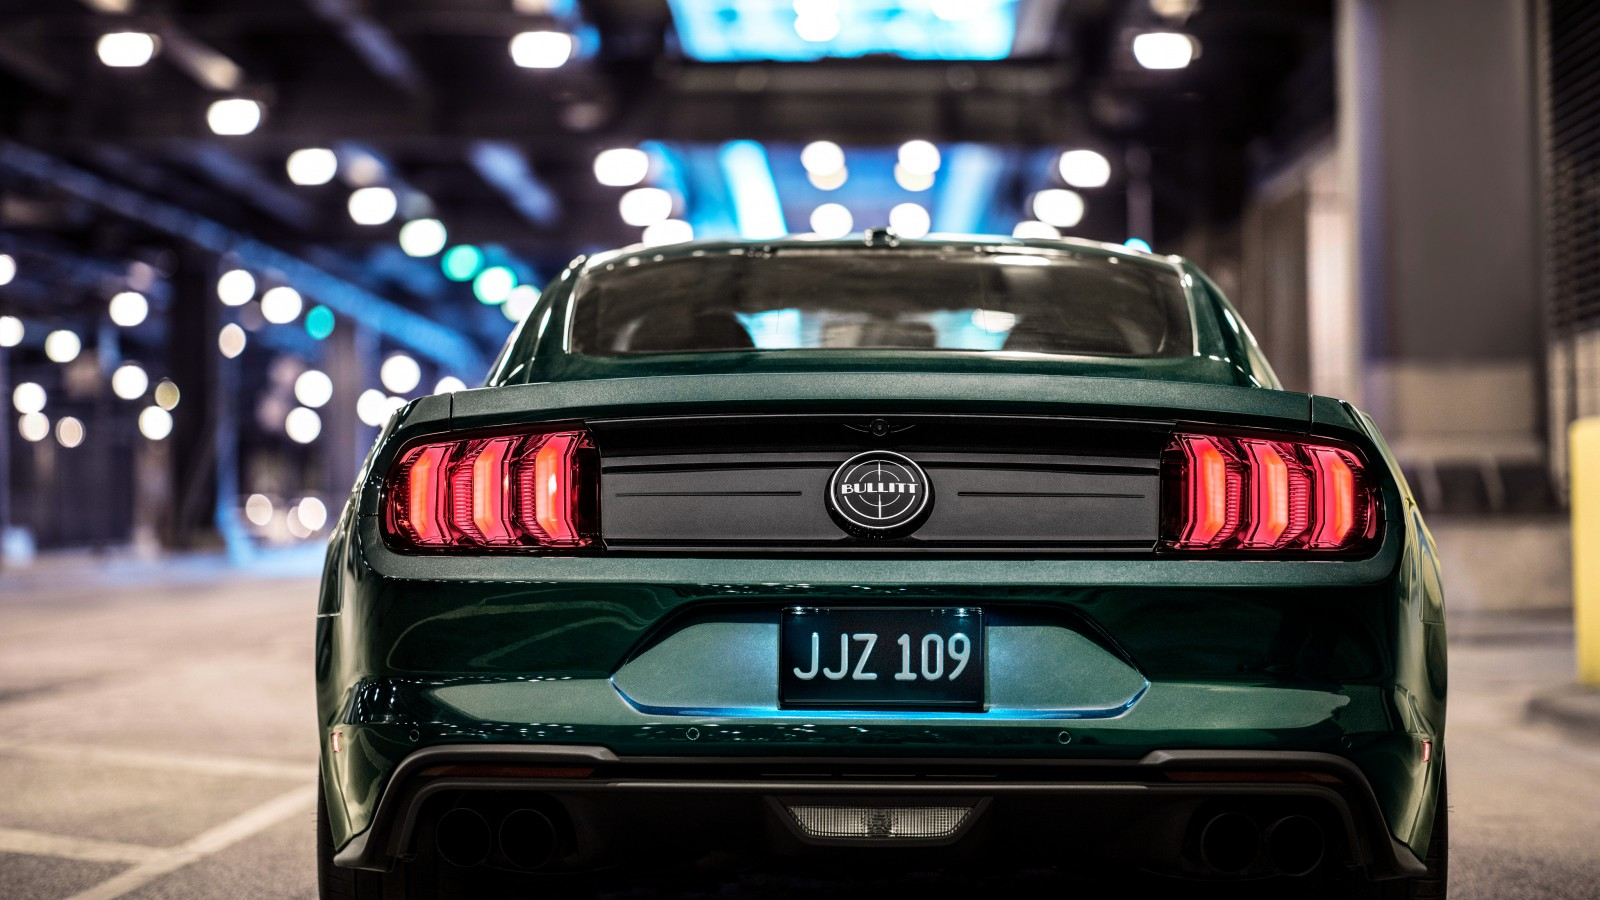 2018 Ford Edge >> 2018 Ford Mustang Bullitt 4K 2 Wallpaper | HD Car Wallpapers | ID #10082